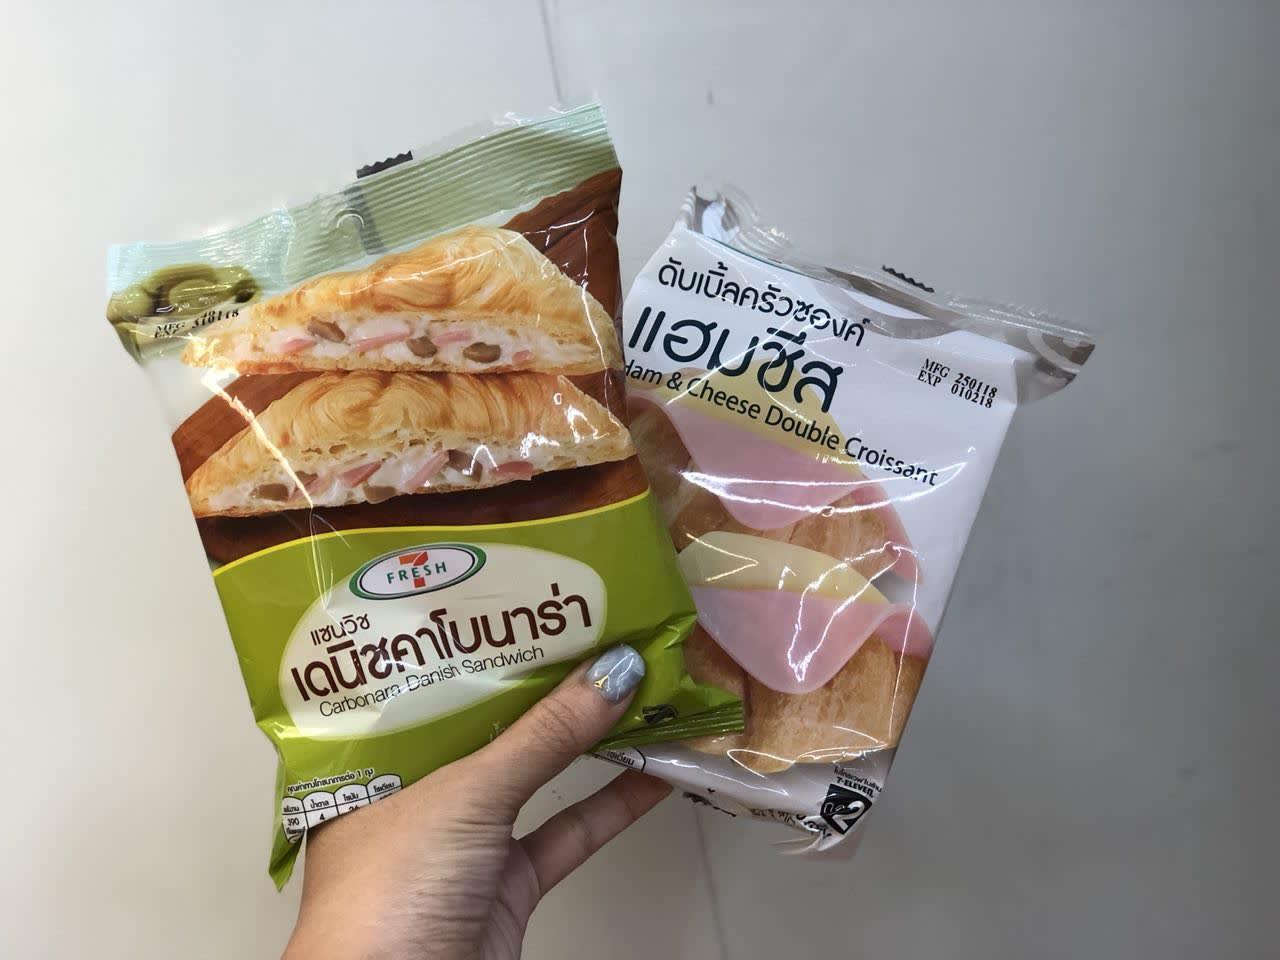 crossaint sandwiches bangkok 7-11